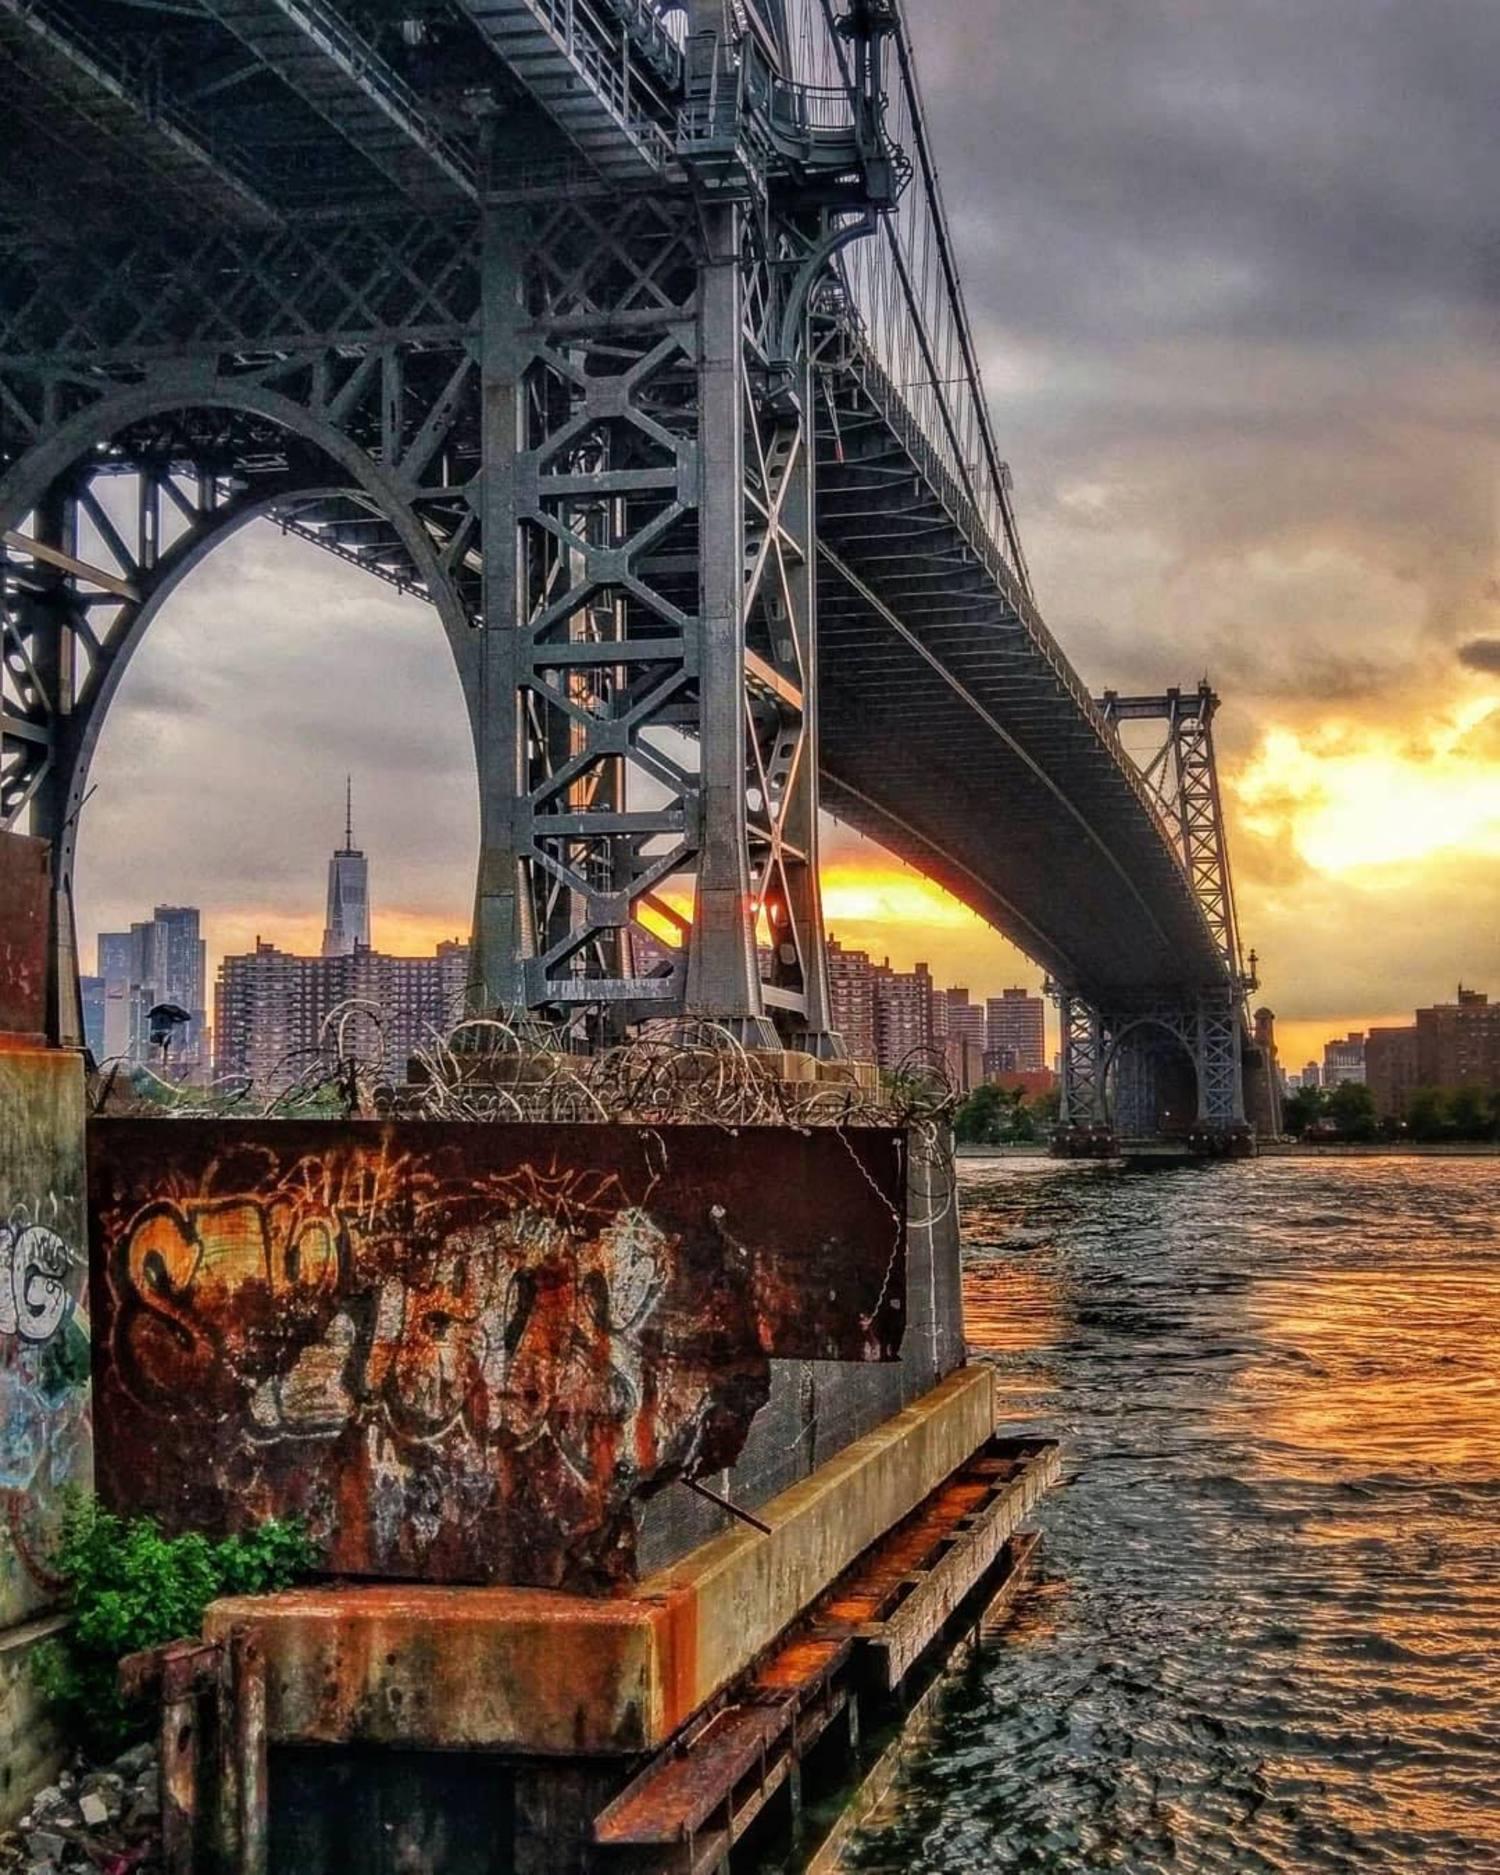 Williamsburg Bridge, Brooklyn. Photo via @beacon_transplant #viewingnyc #newyork #newyorkcity #nyc #williamsburgbridge